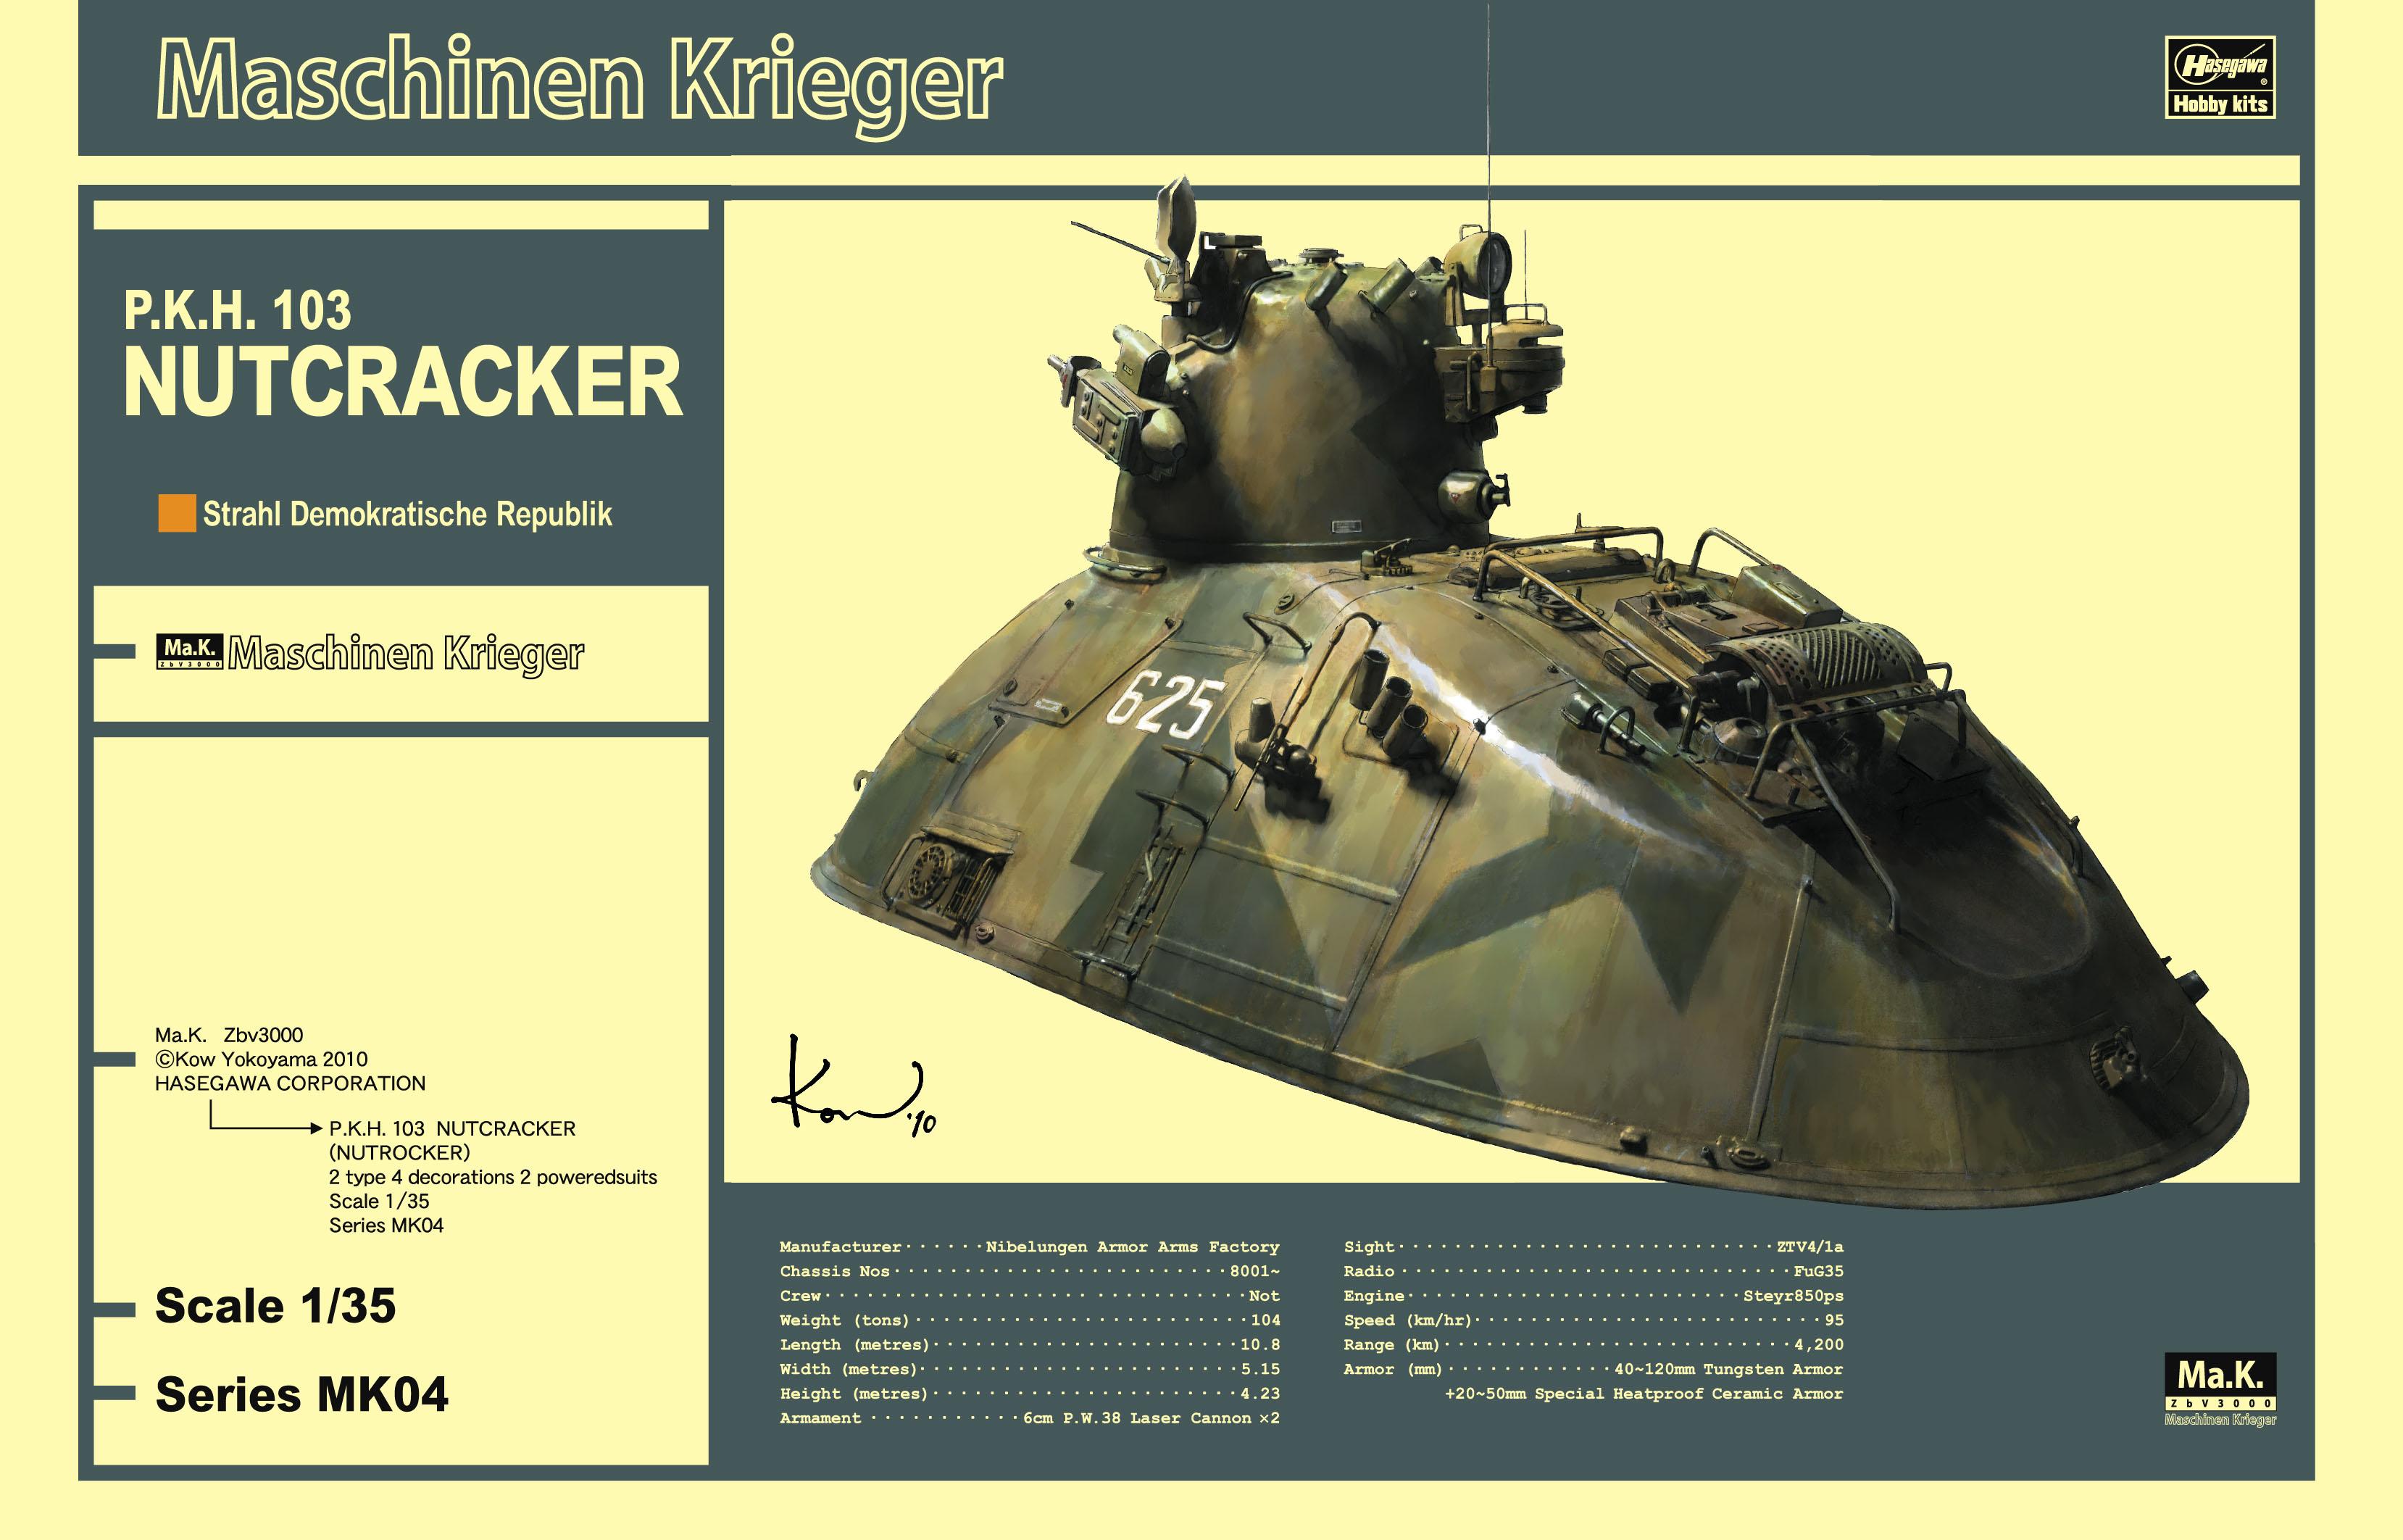 Hasegawa P.K.H. 103 Nutcracker MK04